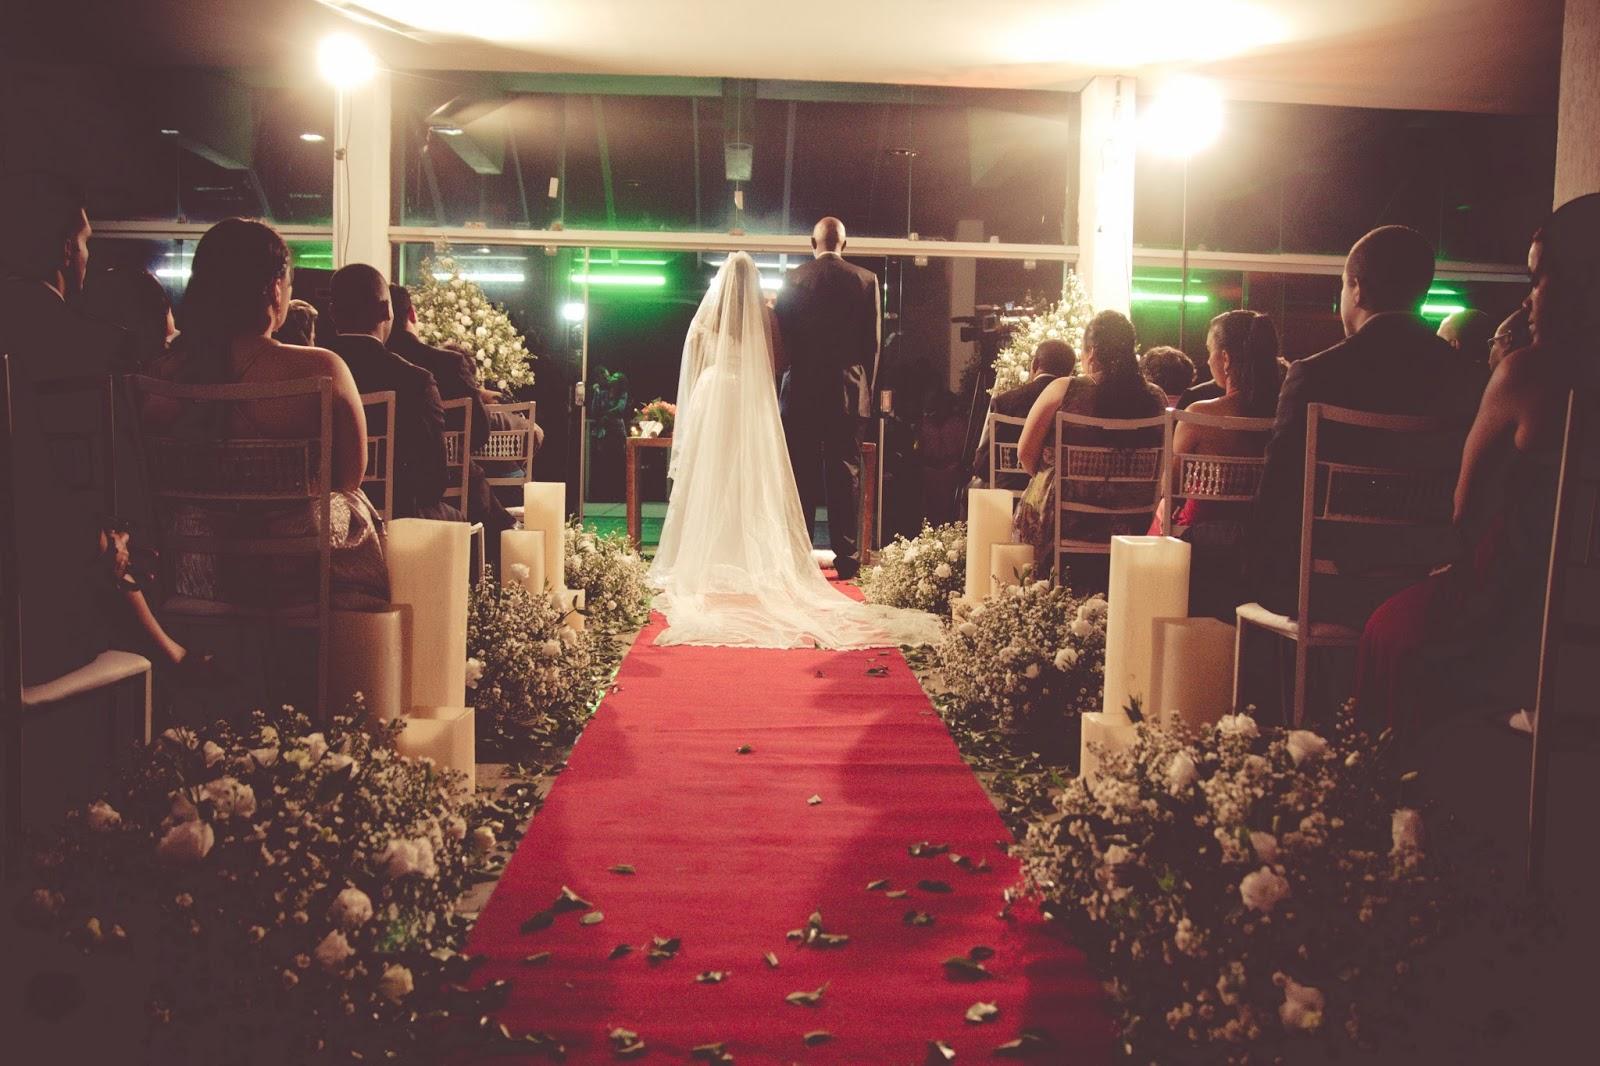 historia-amor-fe-cerimonia-noivos-decoracao